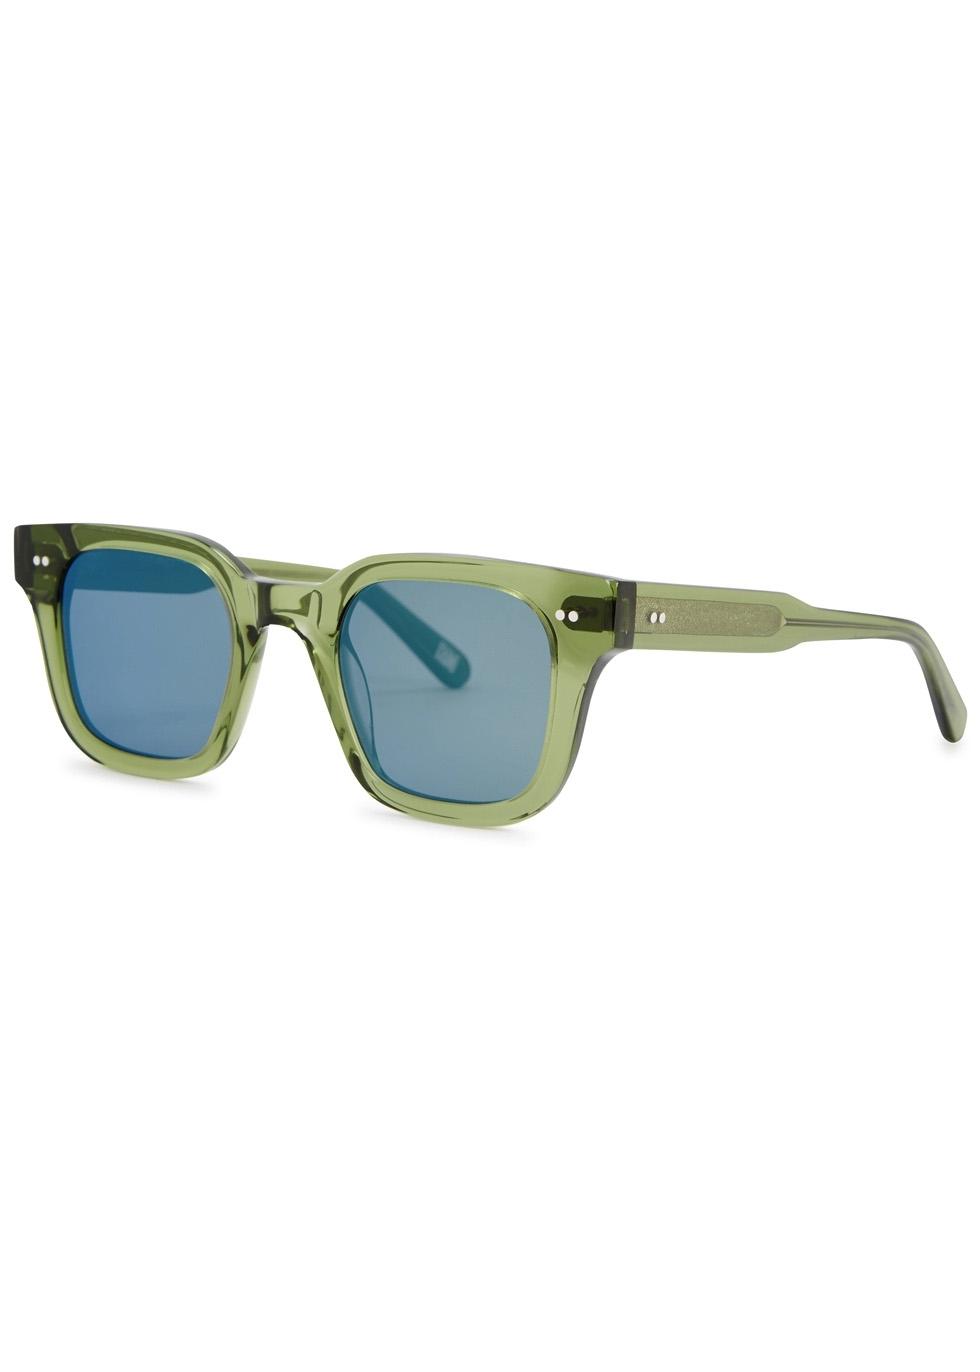 e088ec61ba2 Men s Designer Sunglasses   Eyewear - Harvey Nichols